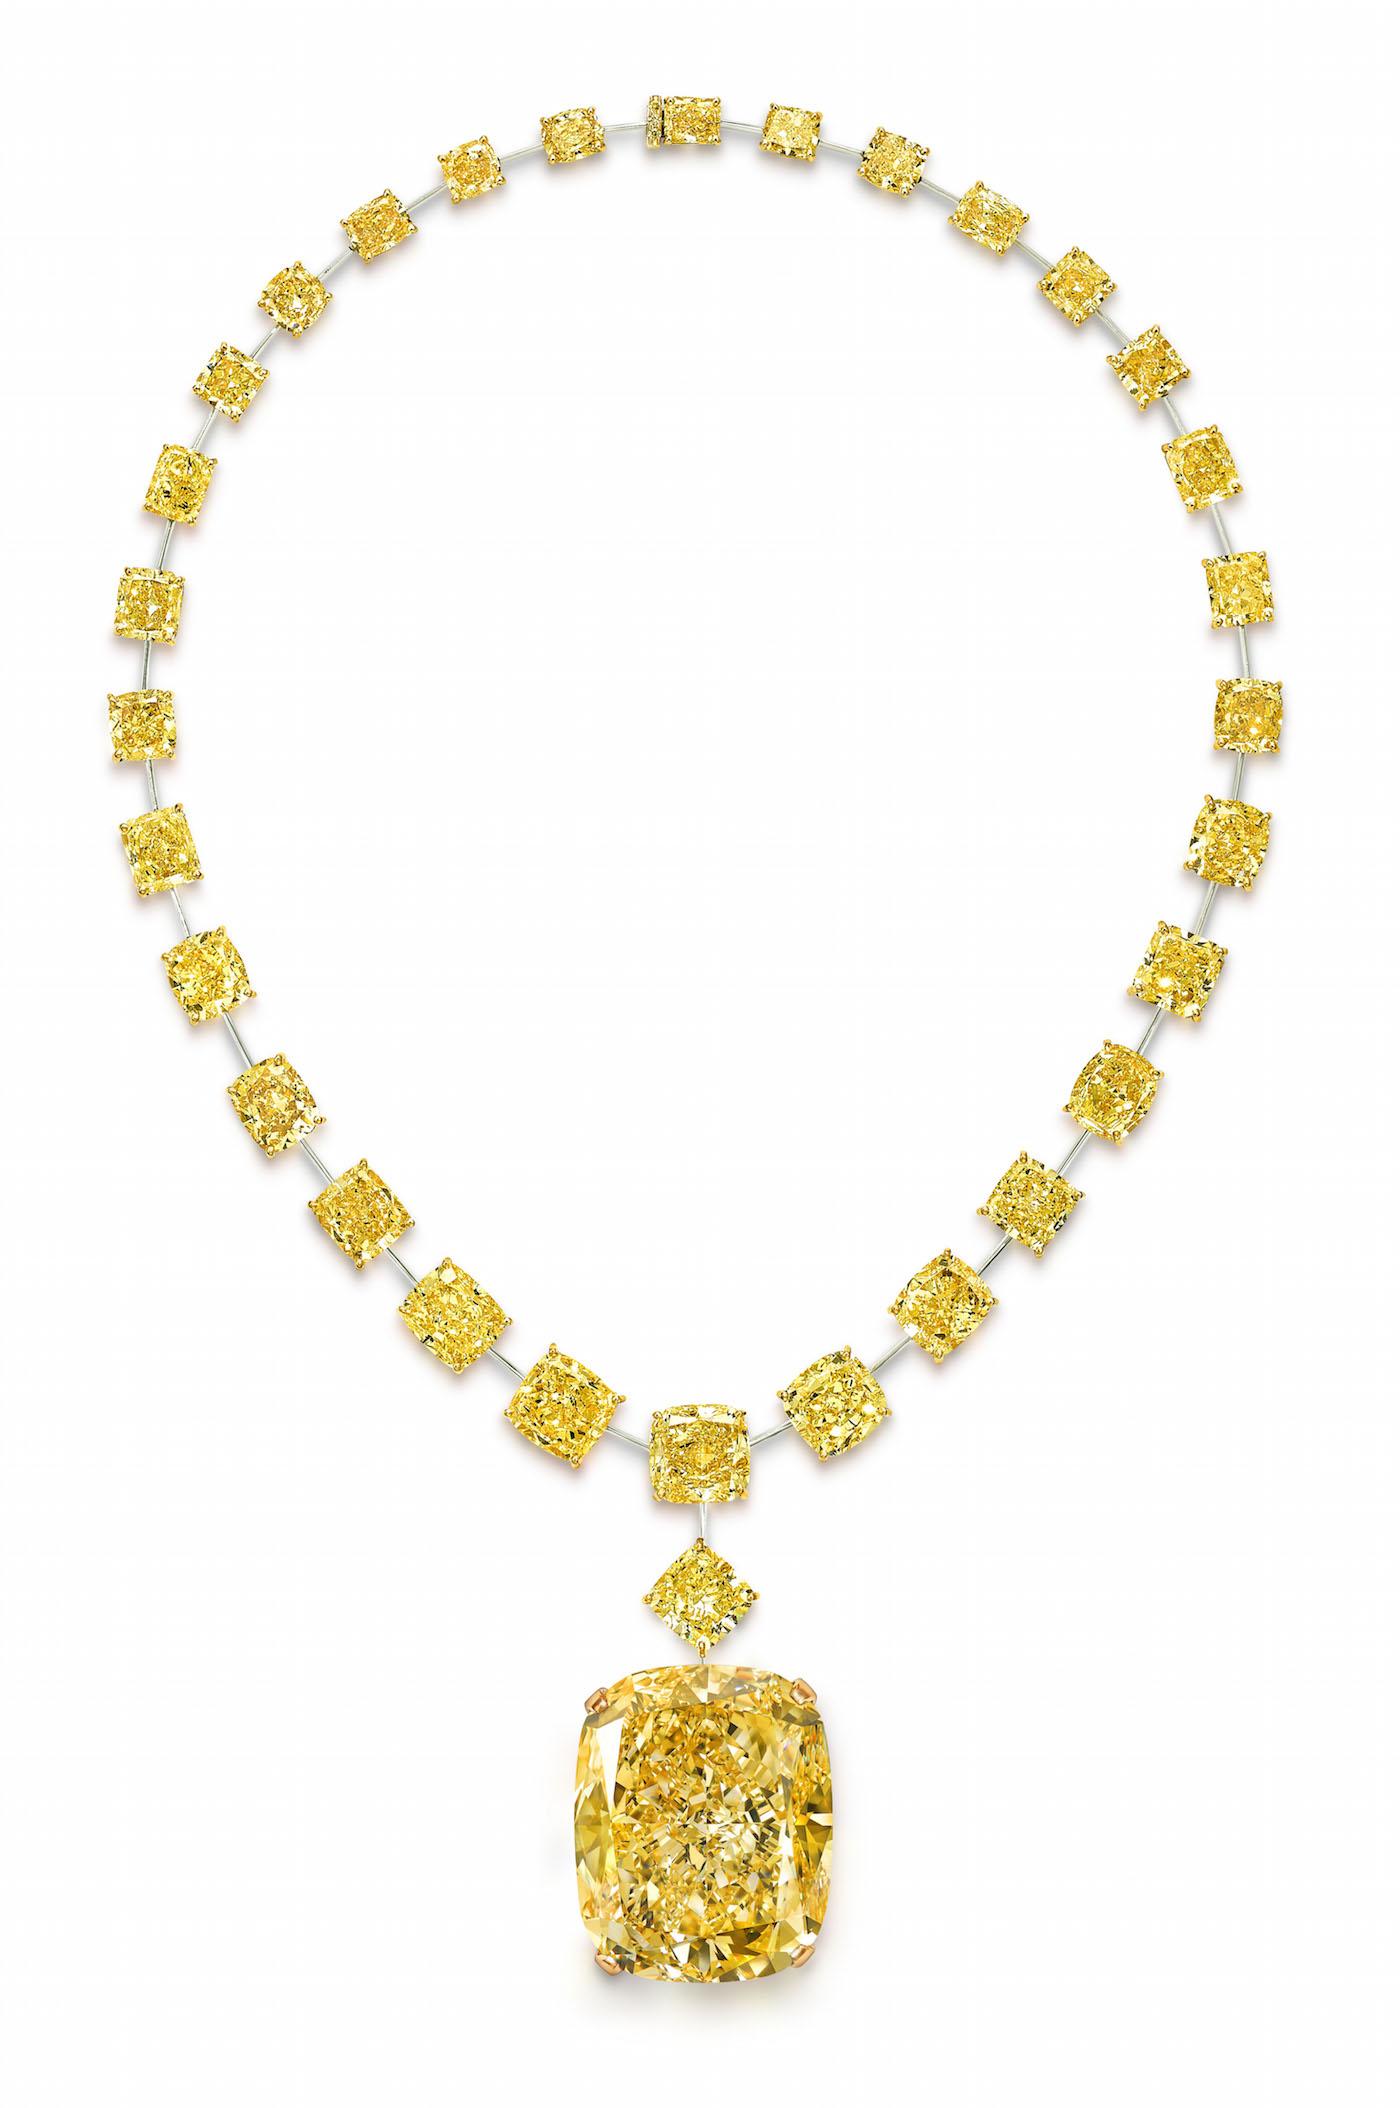 Graff Golden Empress set on a necklace.